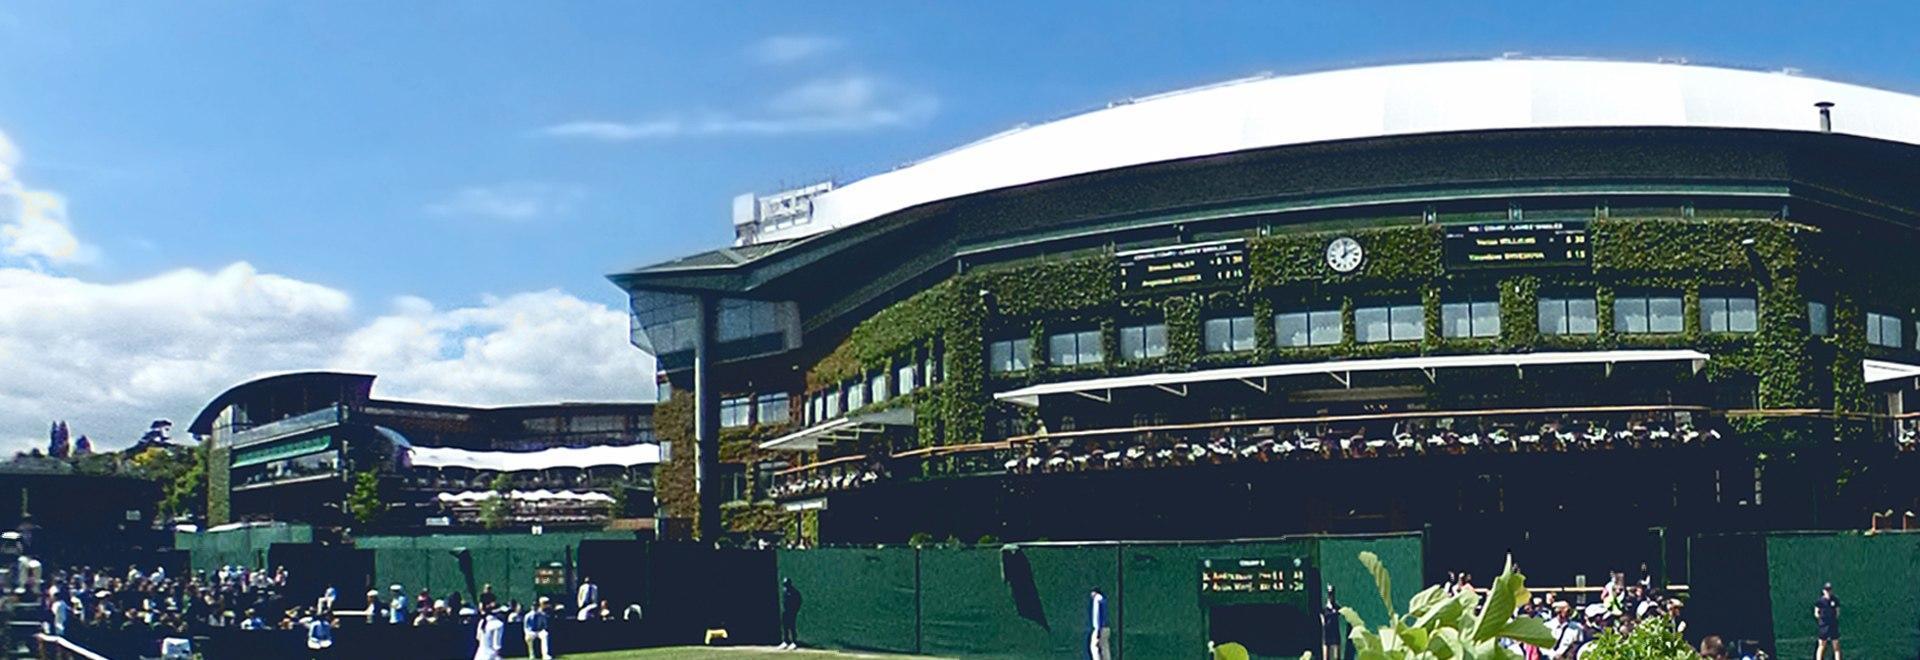 Wimbledon 2013: Seppi - Nishikori. 3° turno